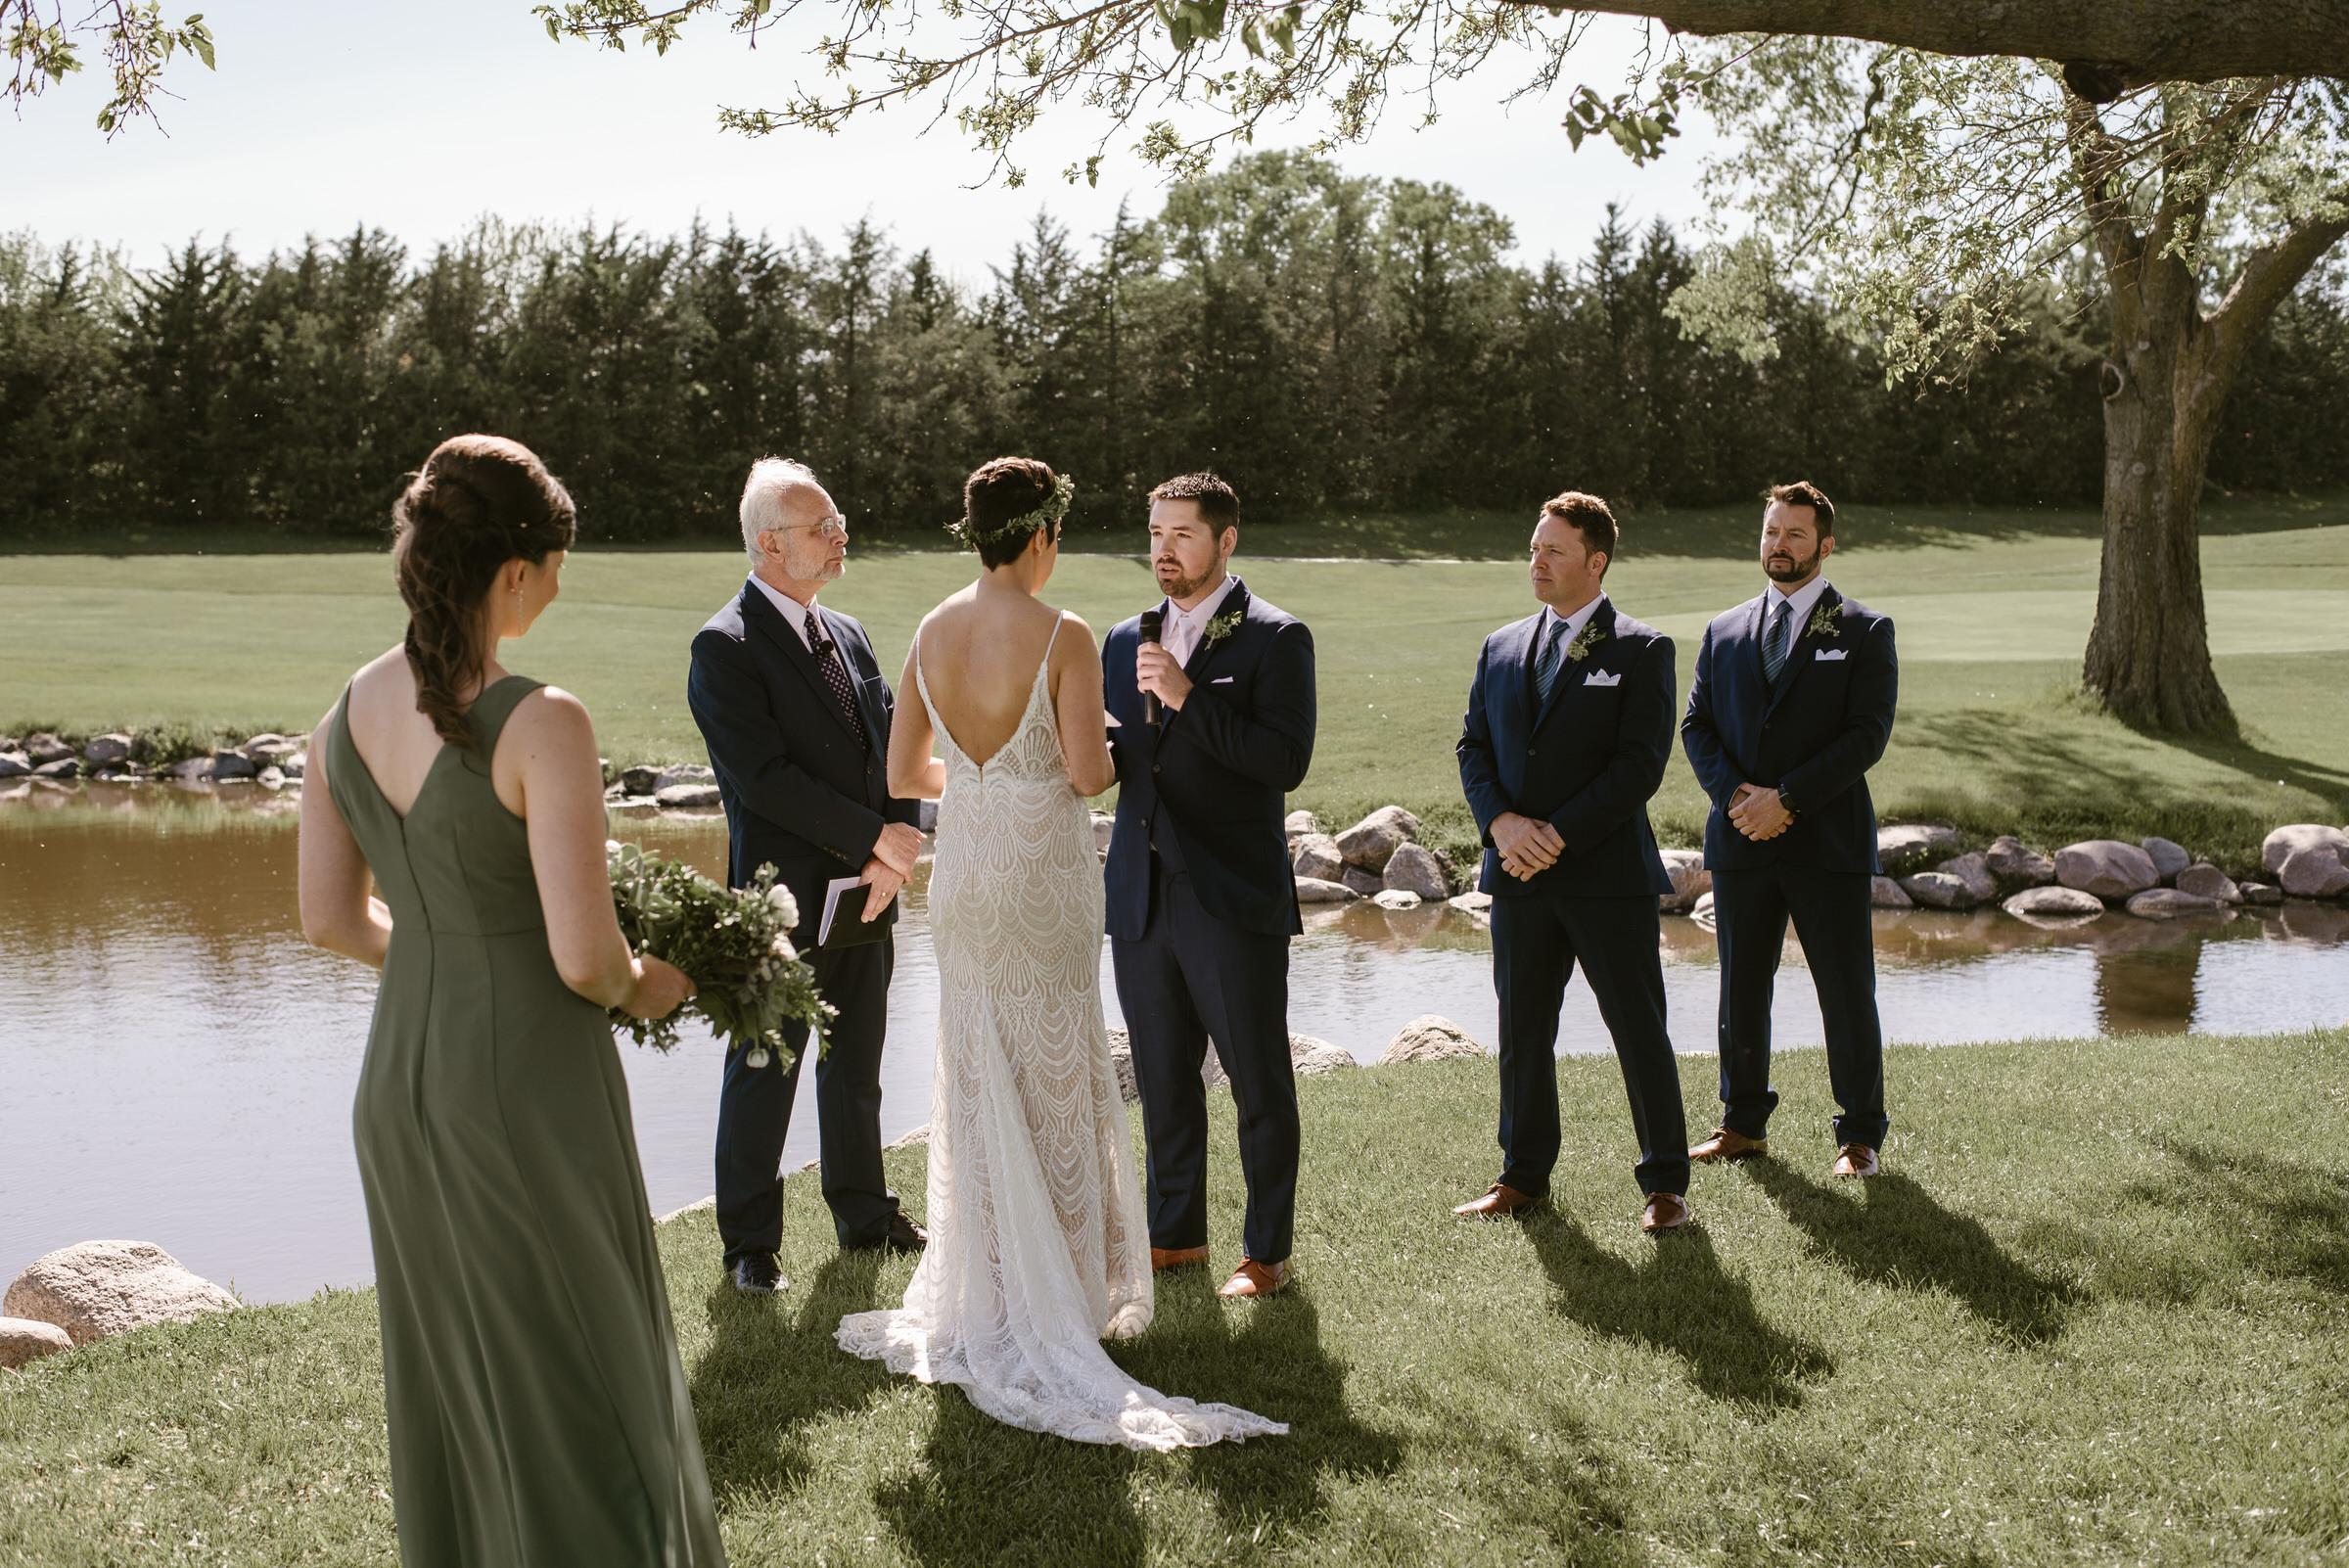 Wilderness-Ridge-Lincoln-Nebraska-Wedding-Kaylie-Sirek-Photography-055.jpg